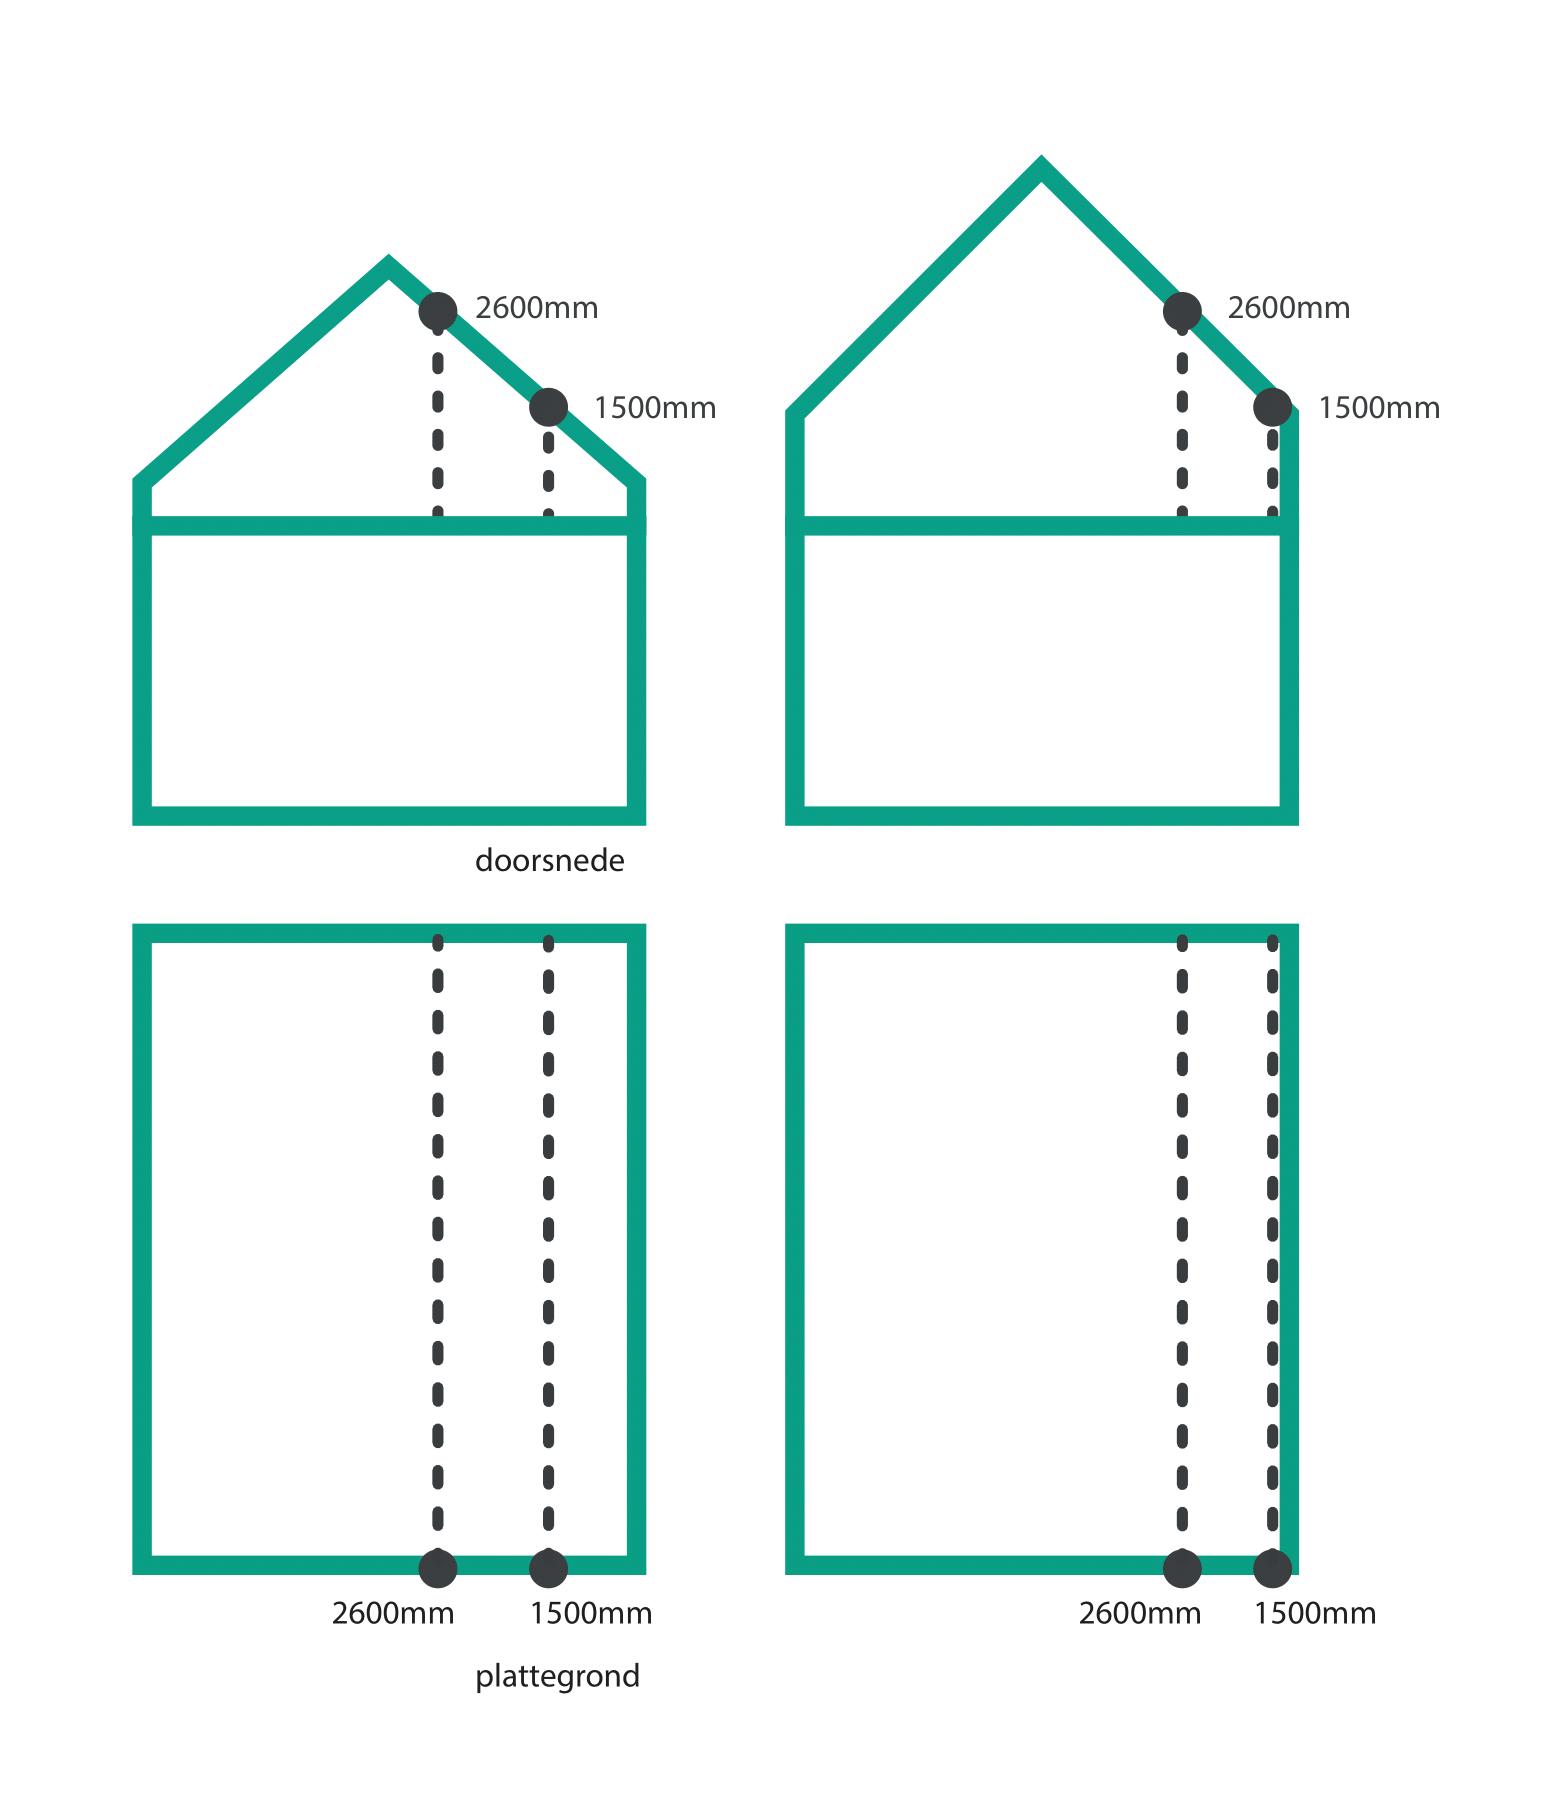 Gebruiksoppervlakte (GBO) en Verblijfsgebied (VG)